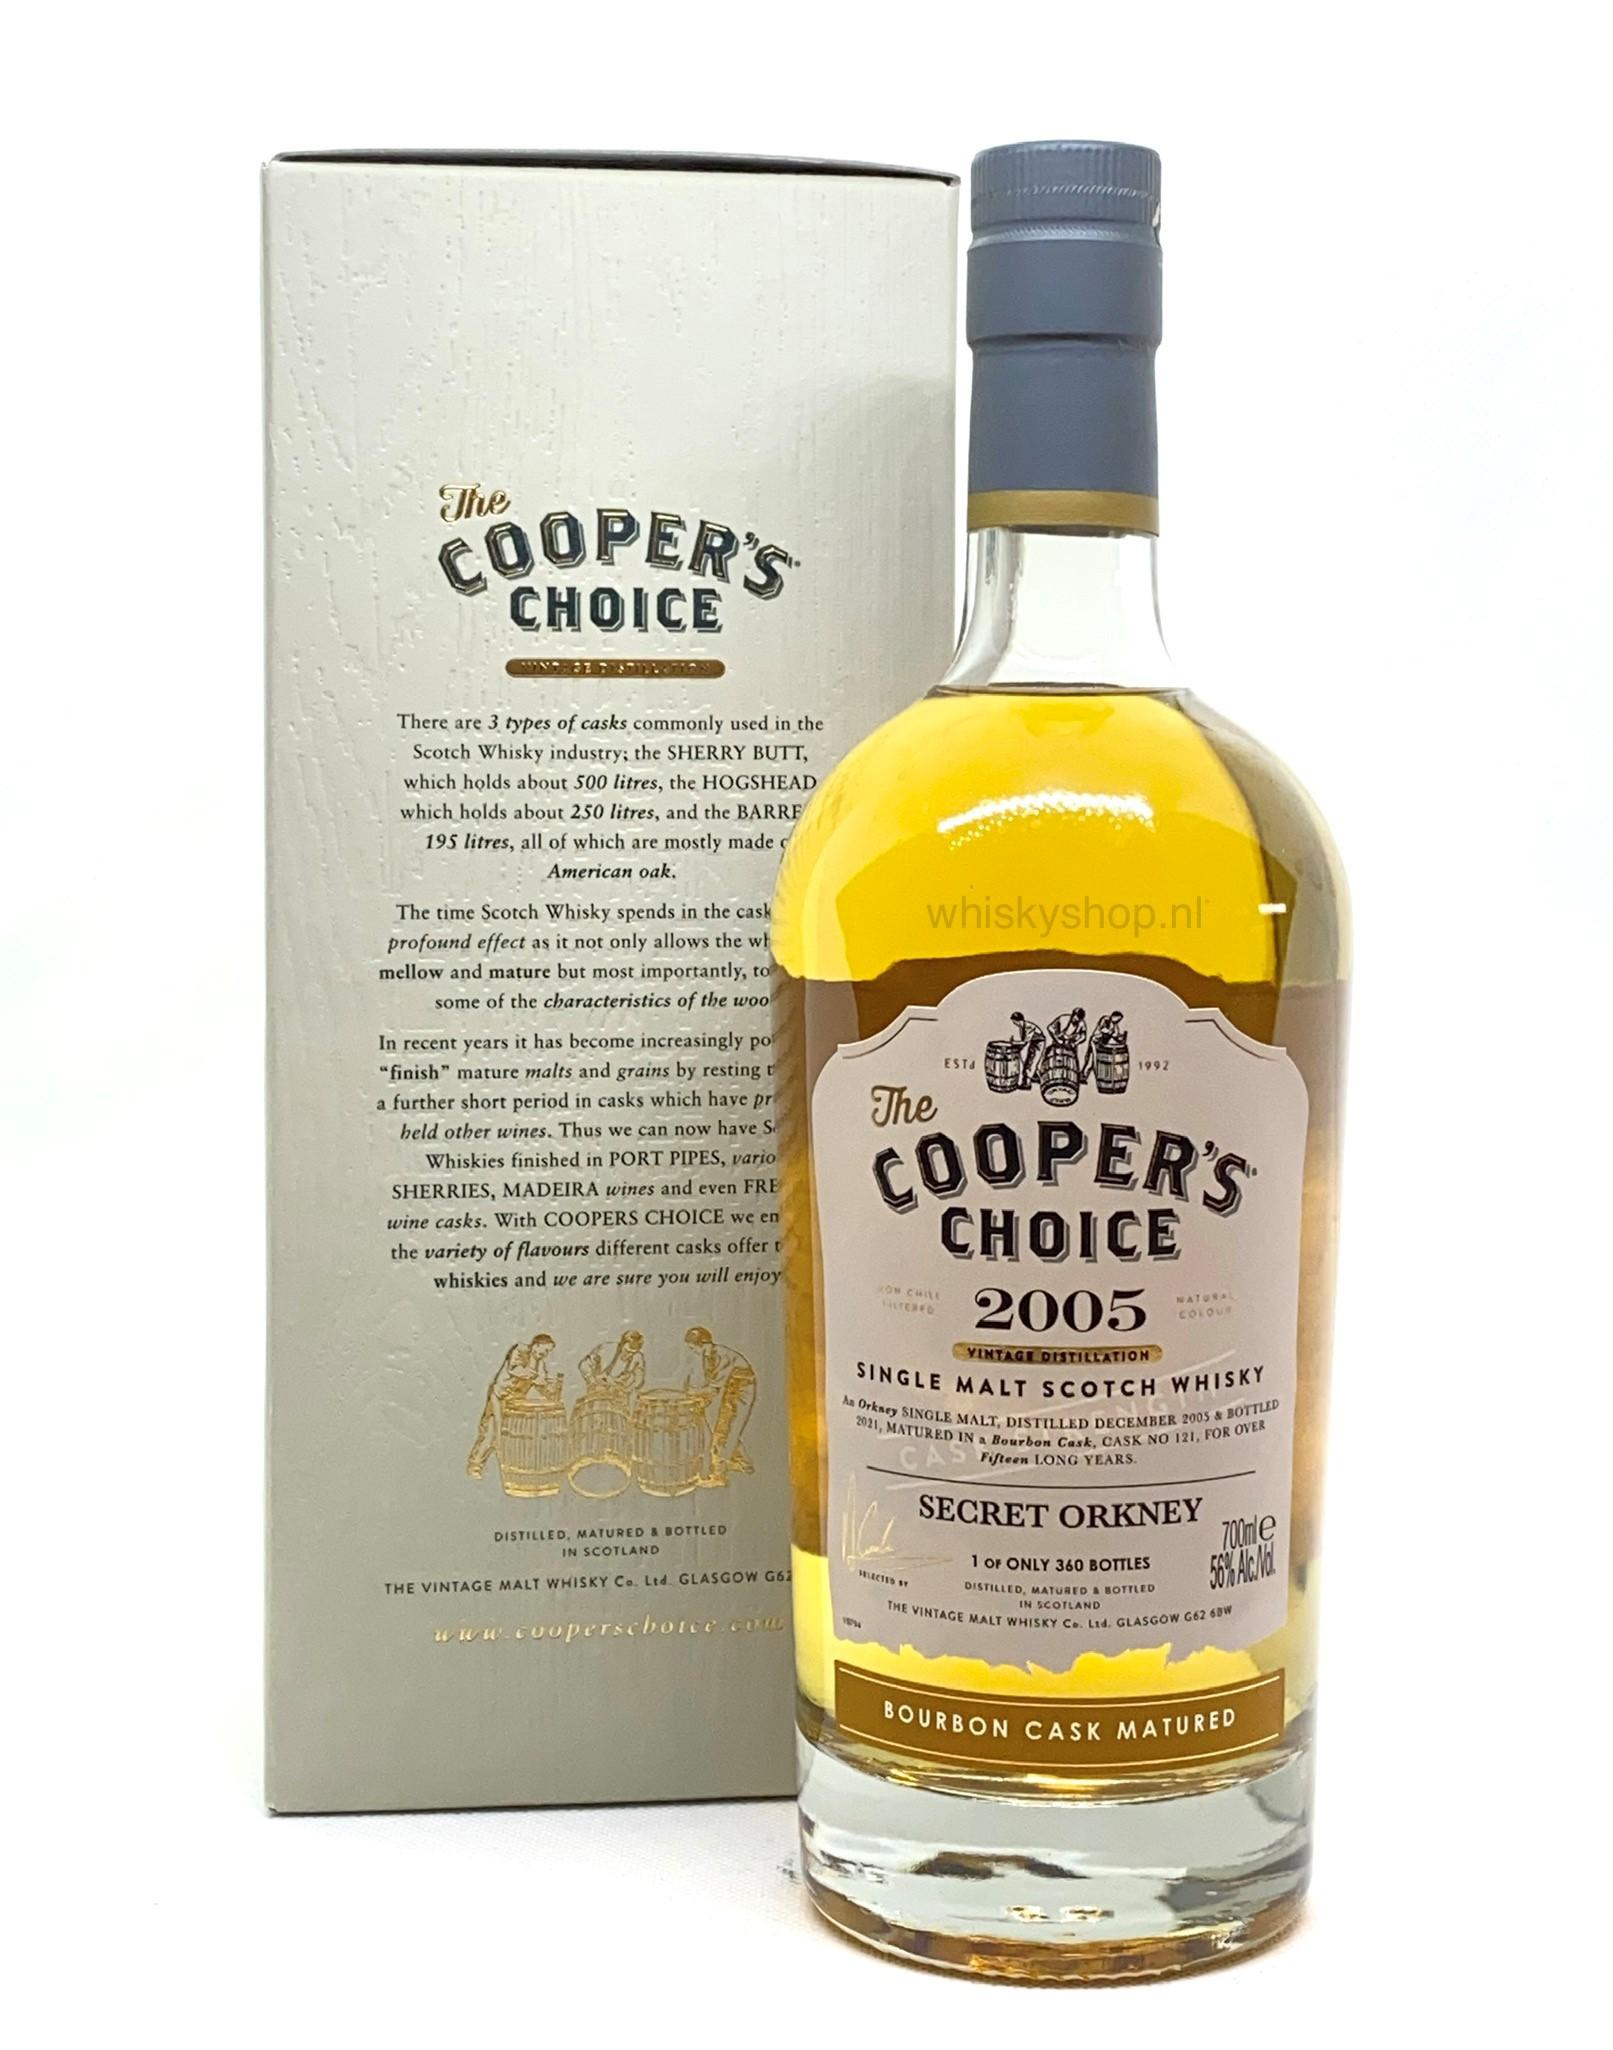 Orkney 2005 Secret Bourbon Cask Matured - Cooper's Choice